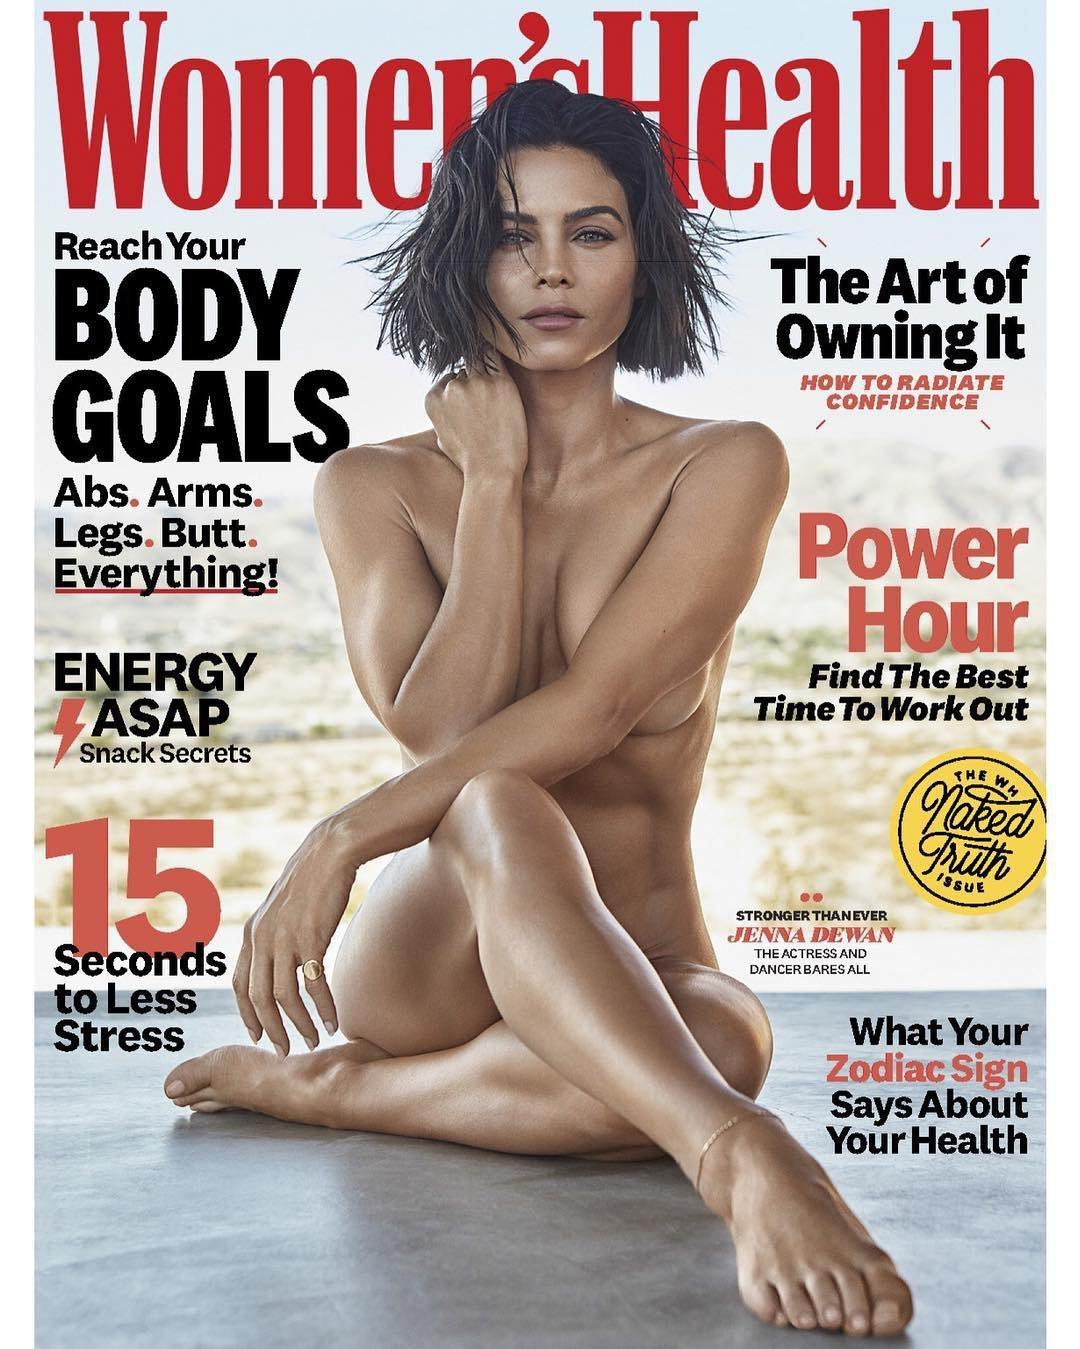 Jenna Dewan goes nude -